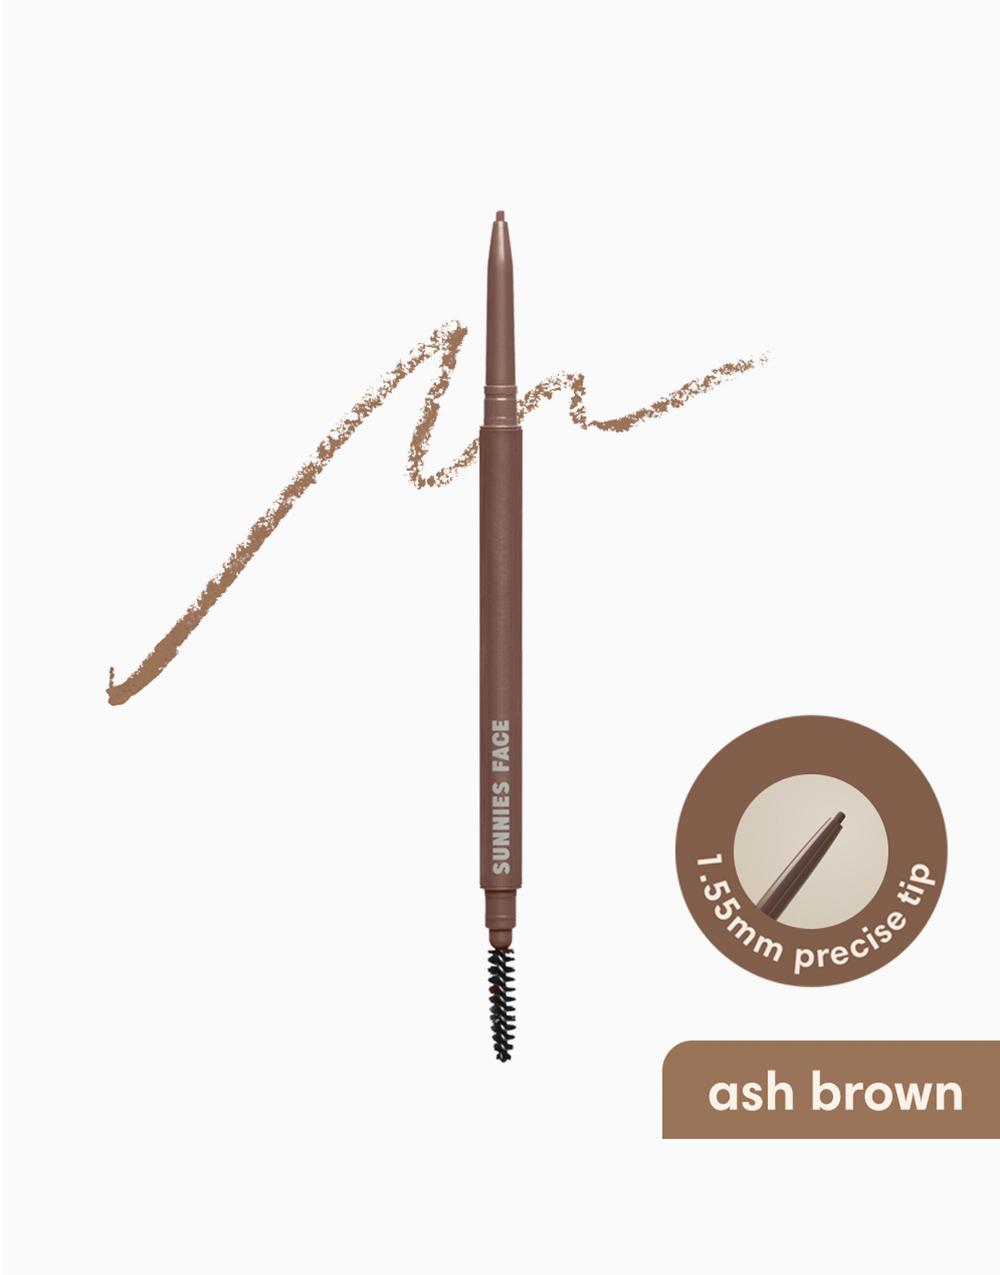 Sunnies Face Lifebrow Skinny Pencil [Defining Eyebrow Pencil] (Ash Brown) by Sunnies Face